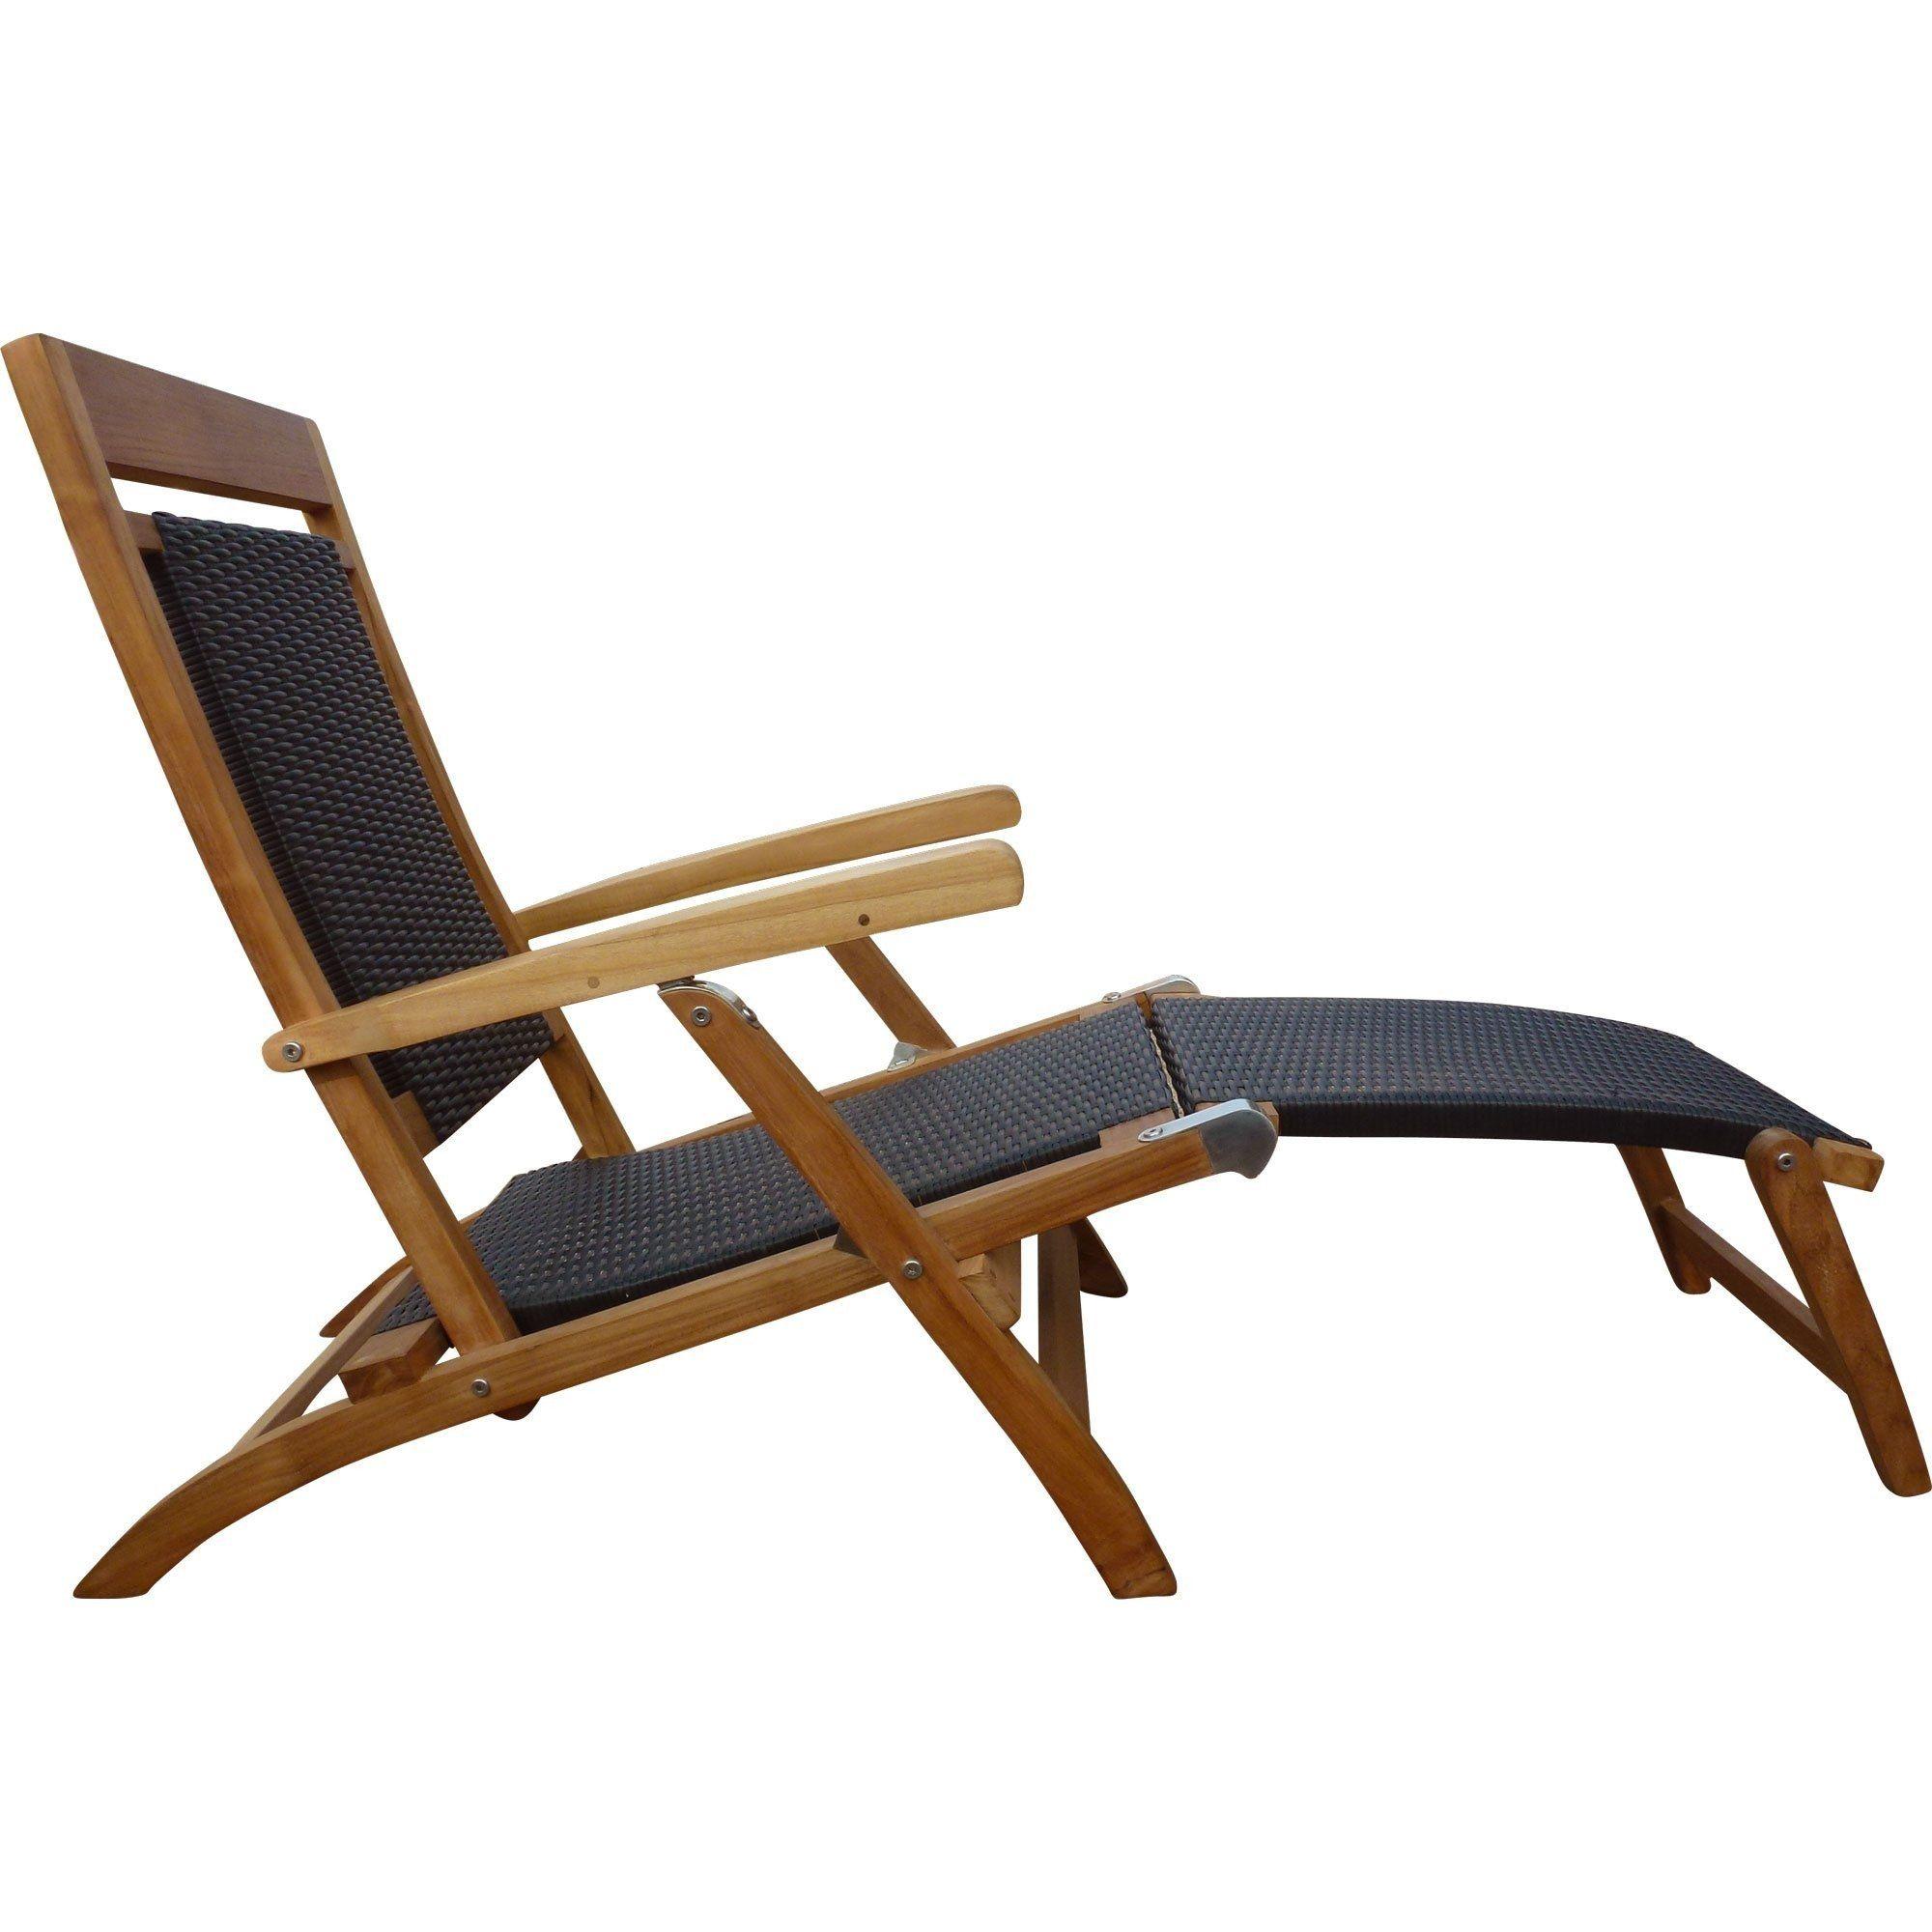 Teak Wood Narmada Outdoor Reclining Patio Steamer Chair Black Teak Chaise Lounge Chaise Lounge Patio Lounge